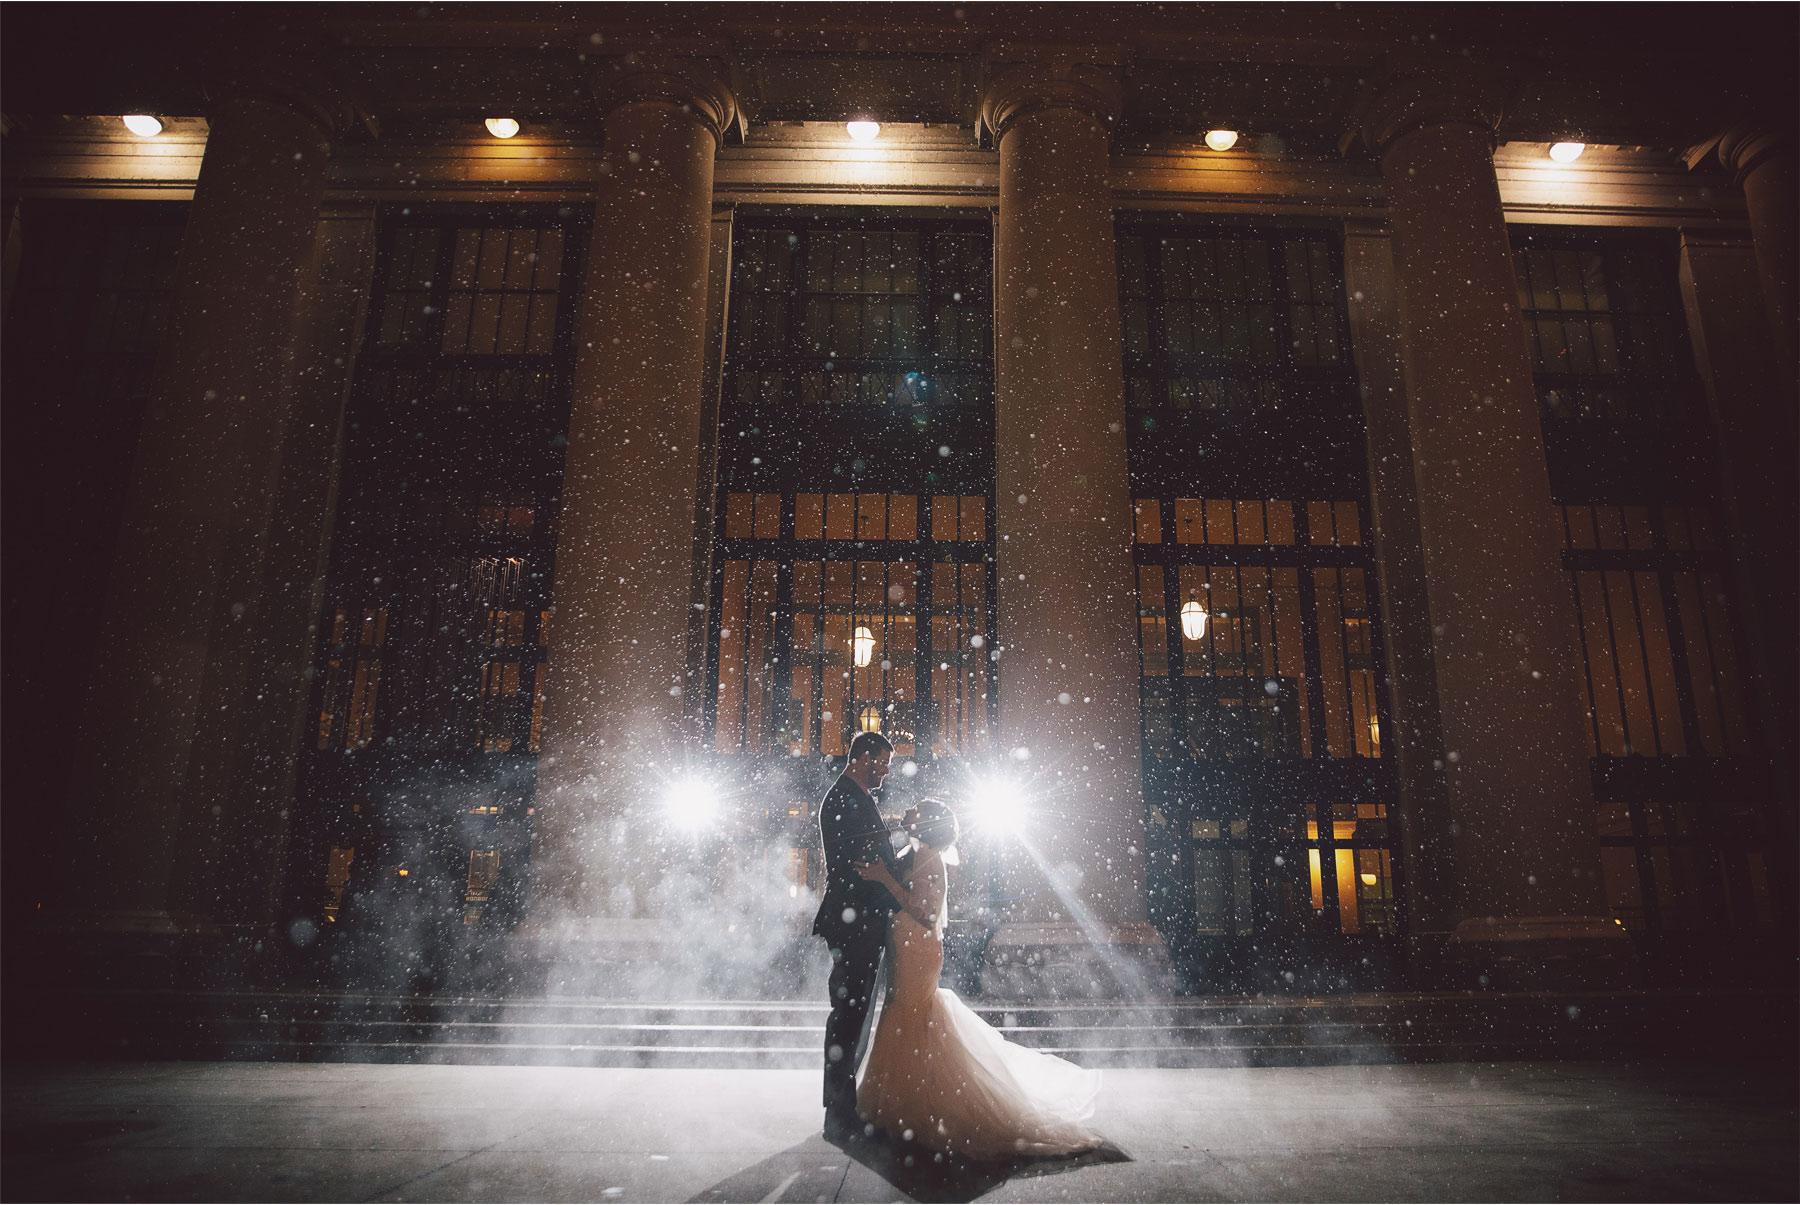 21-Saint-Paul-Minnesota-Wedding-by-Vick-Photography-Union-Depot-Lifetime-Network-David-Tutera-My-Great-Big-Live-Wedding-Snow-Winter-Night-Jen-and-Rob.jpg